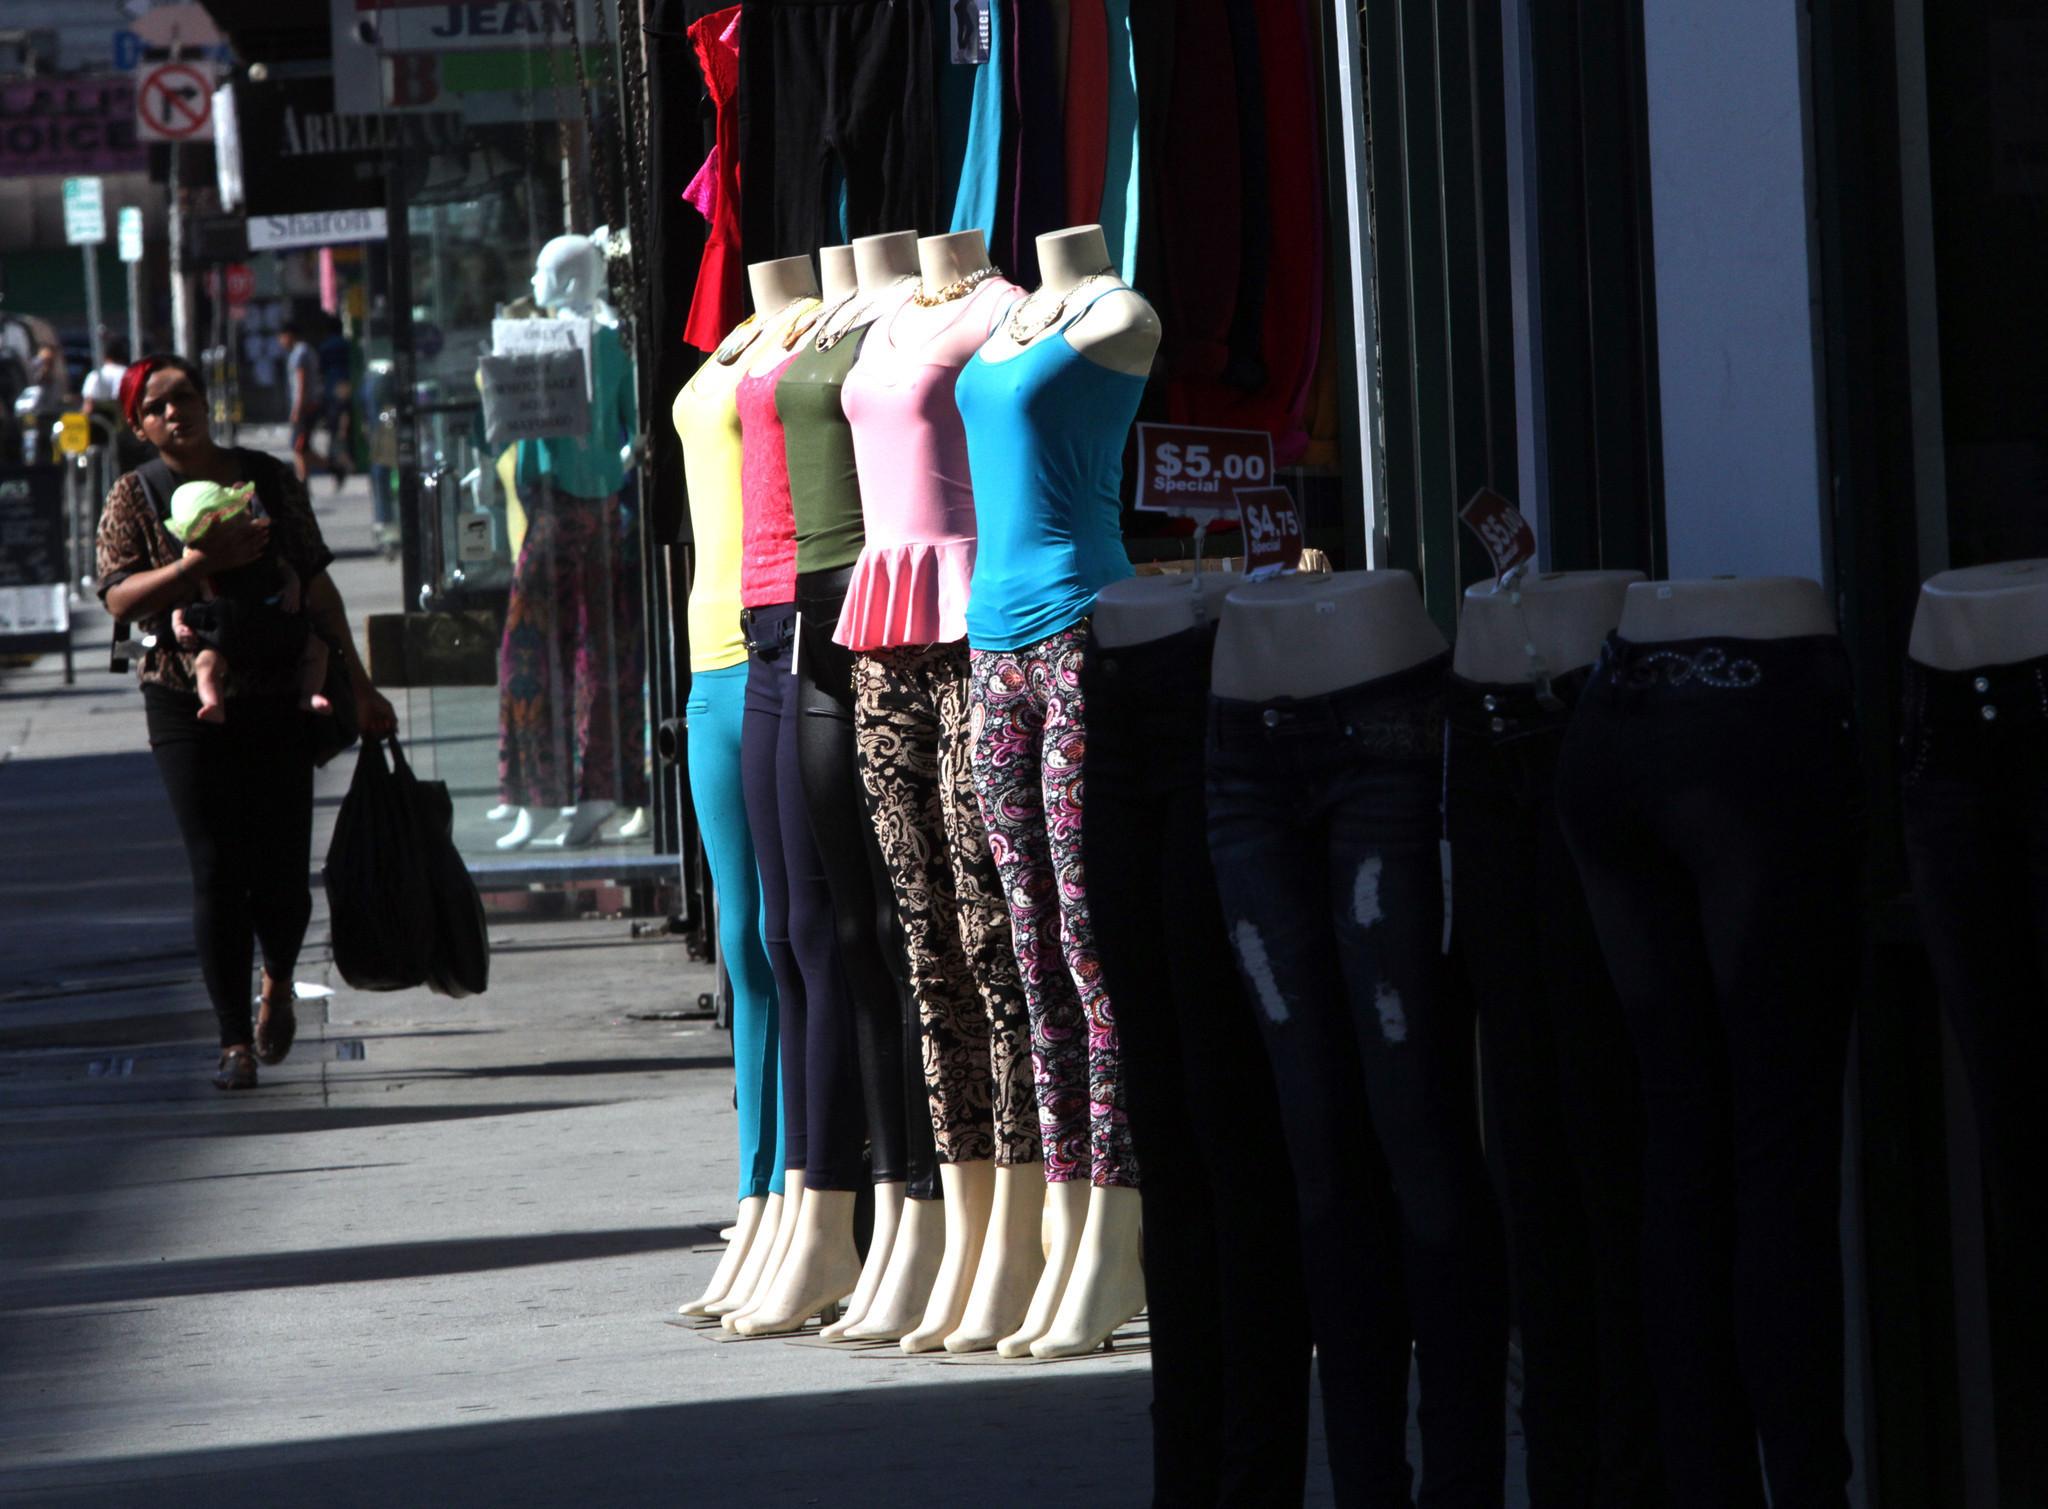 La la fashion district - Fashion District Crackdown Strict Cash Reporting Ordered After Raids La Times